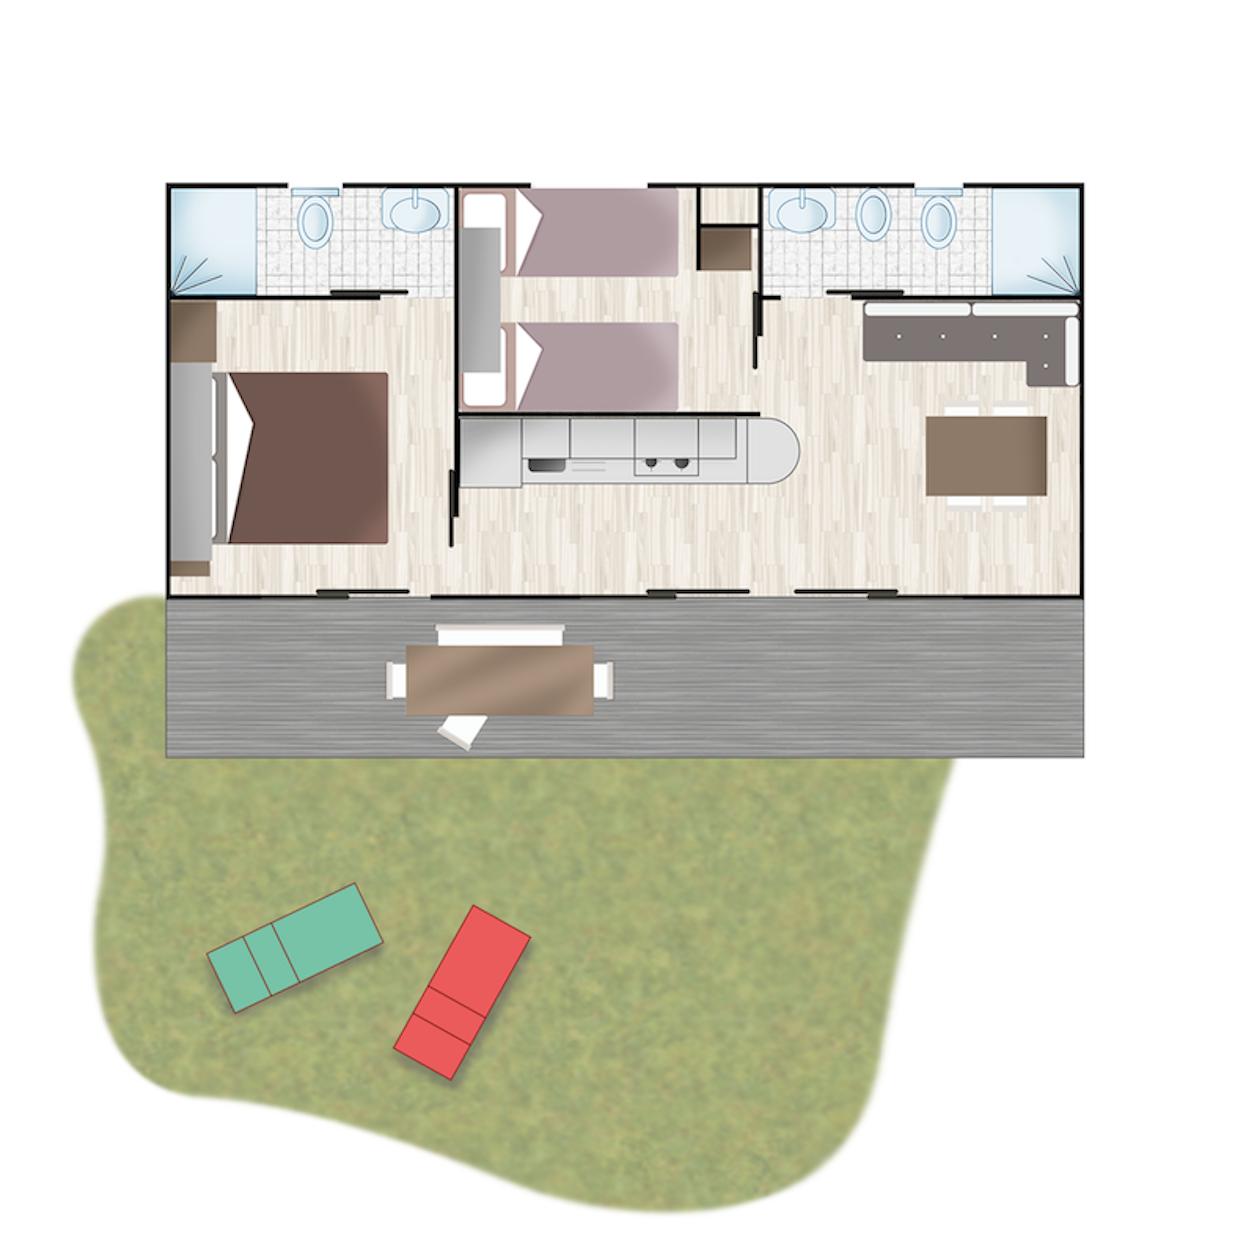 Piantina - Casa Mobile Elegance | Villaggio Camping Adria